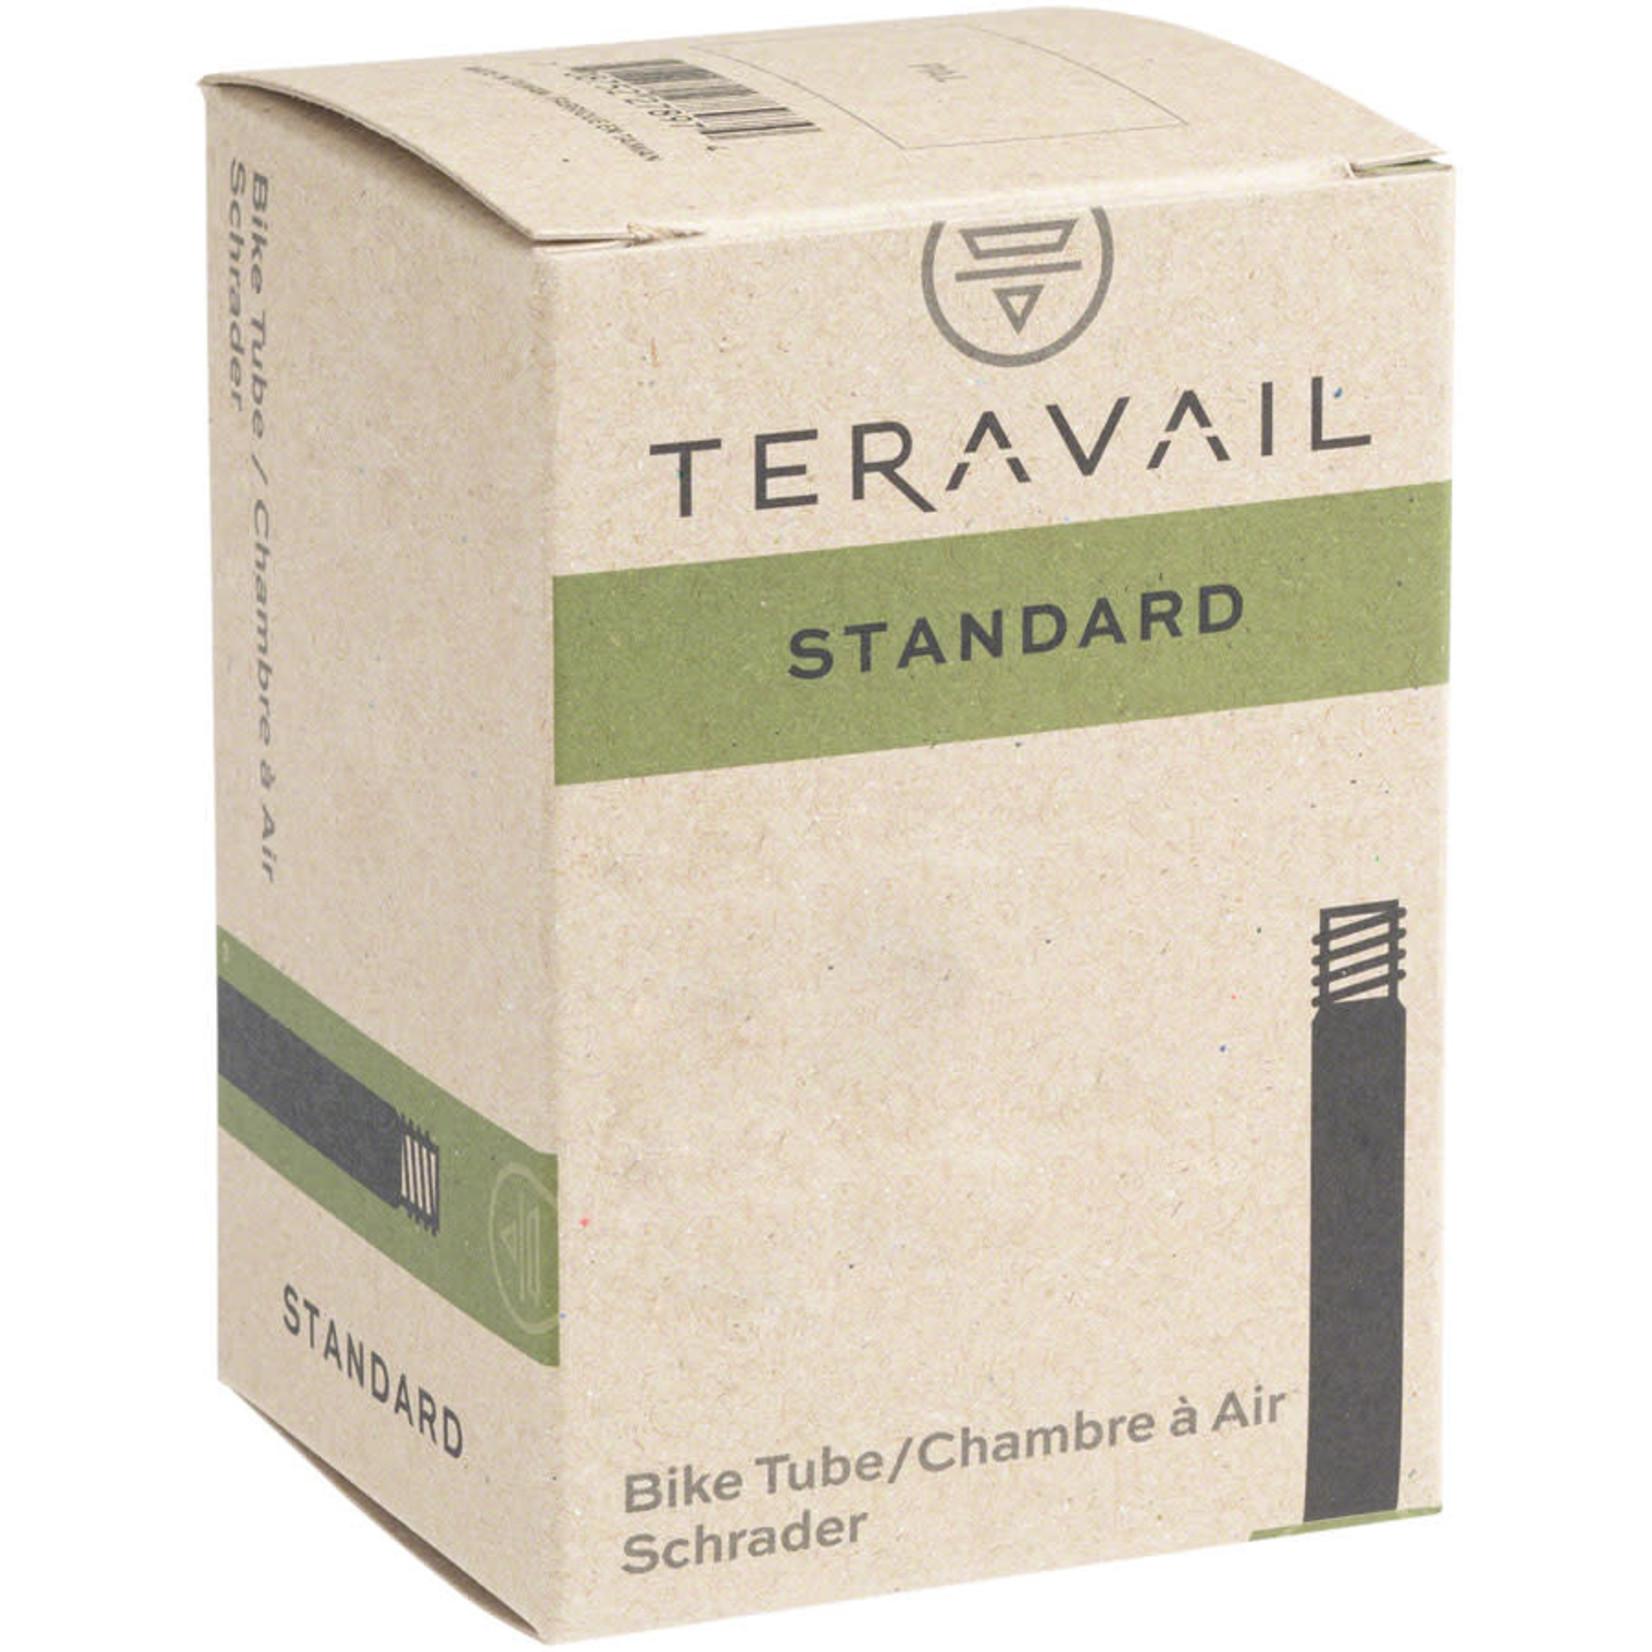 "Q-Tubes Q-Tubes / Teravail 26 x 1.9-2.125"" 48 mm Long Schrader Valve Tube"